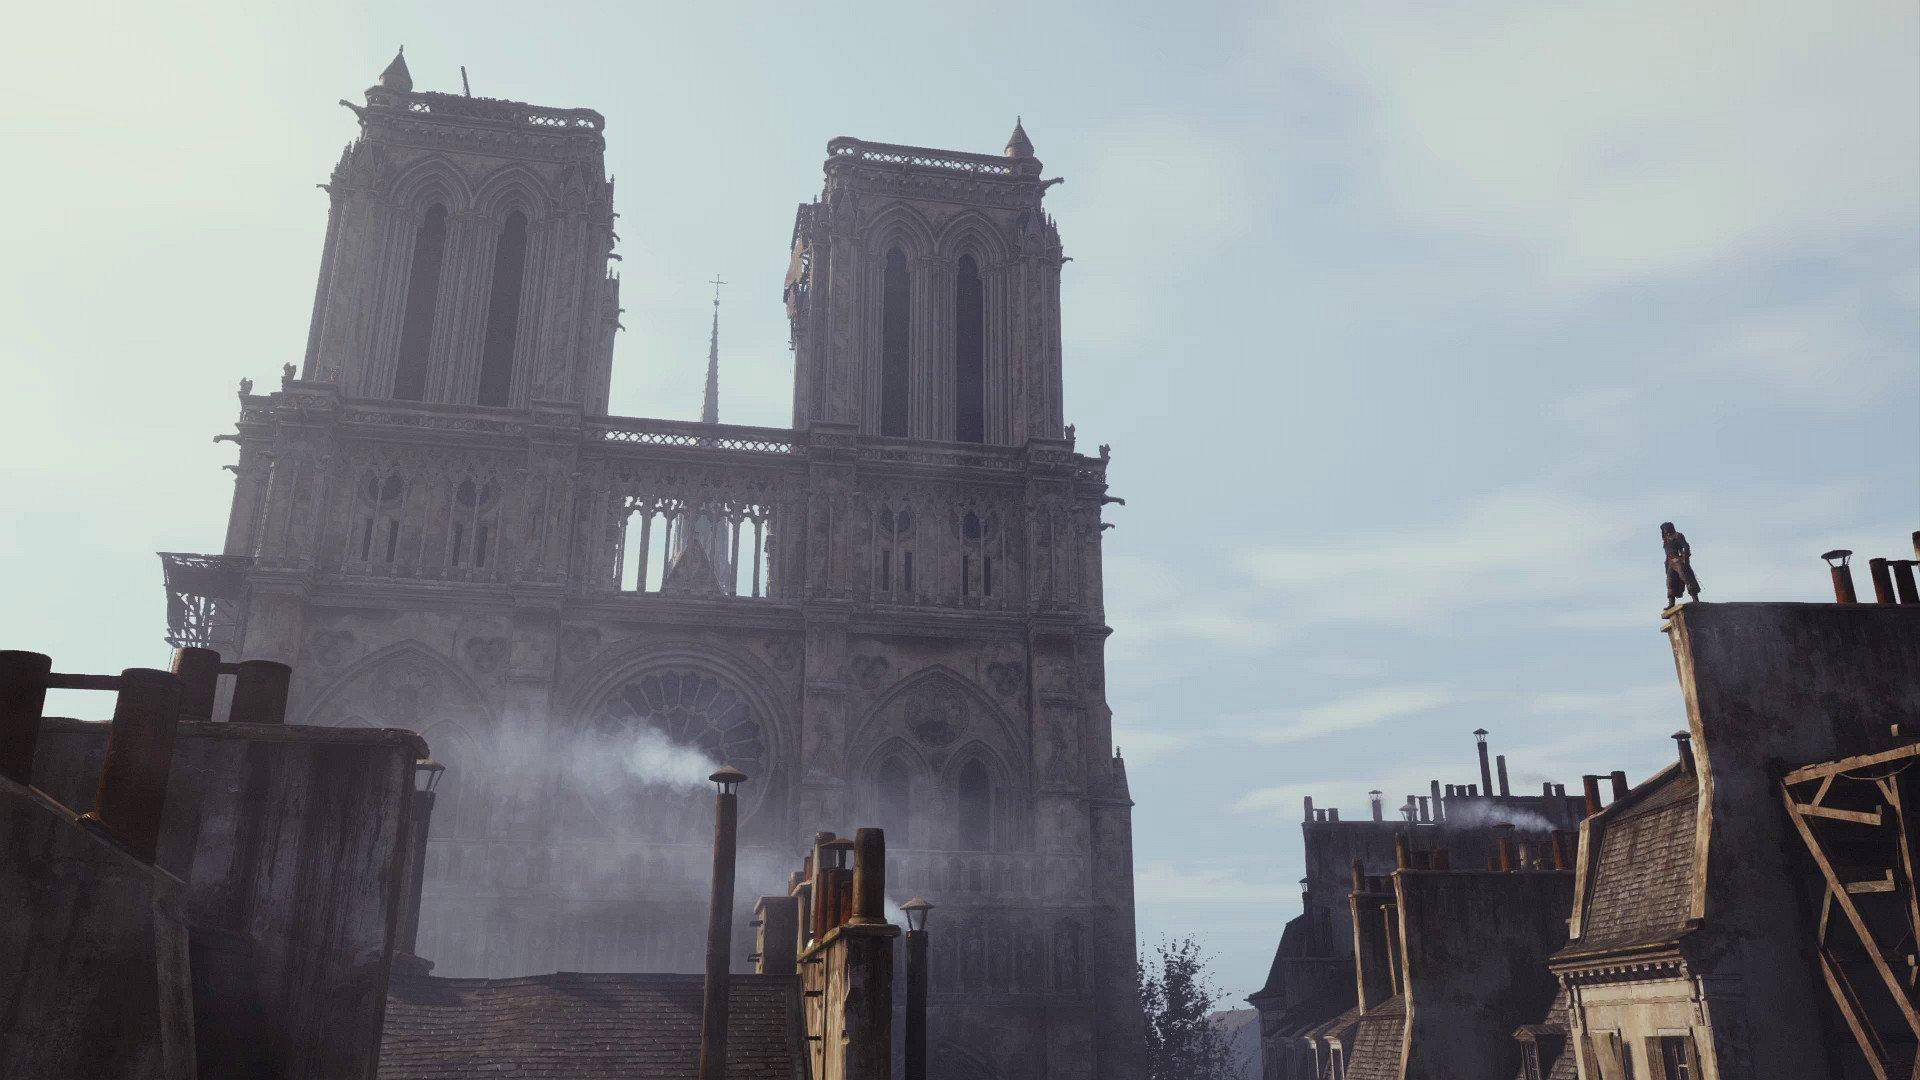 assassin  039 s creed unity 2492277 با اولین تصاویر از Assassin's Creed : Unity همراه شوید : بازی تنها بر روی نسل هشتم منتشر خواهد شد